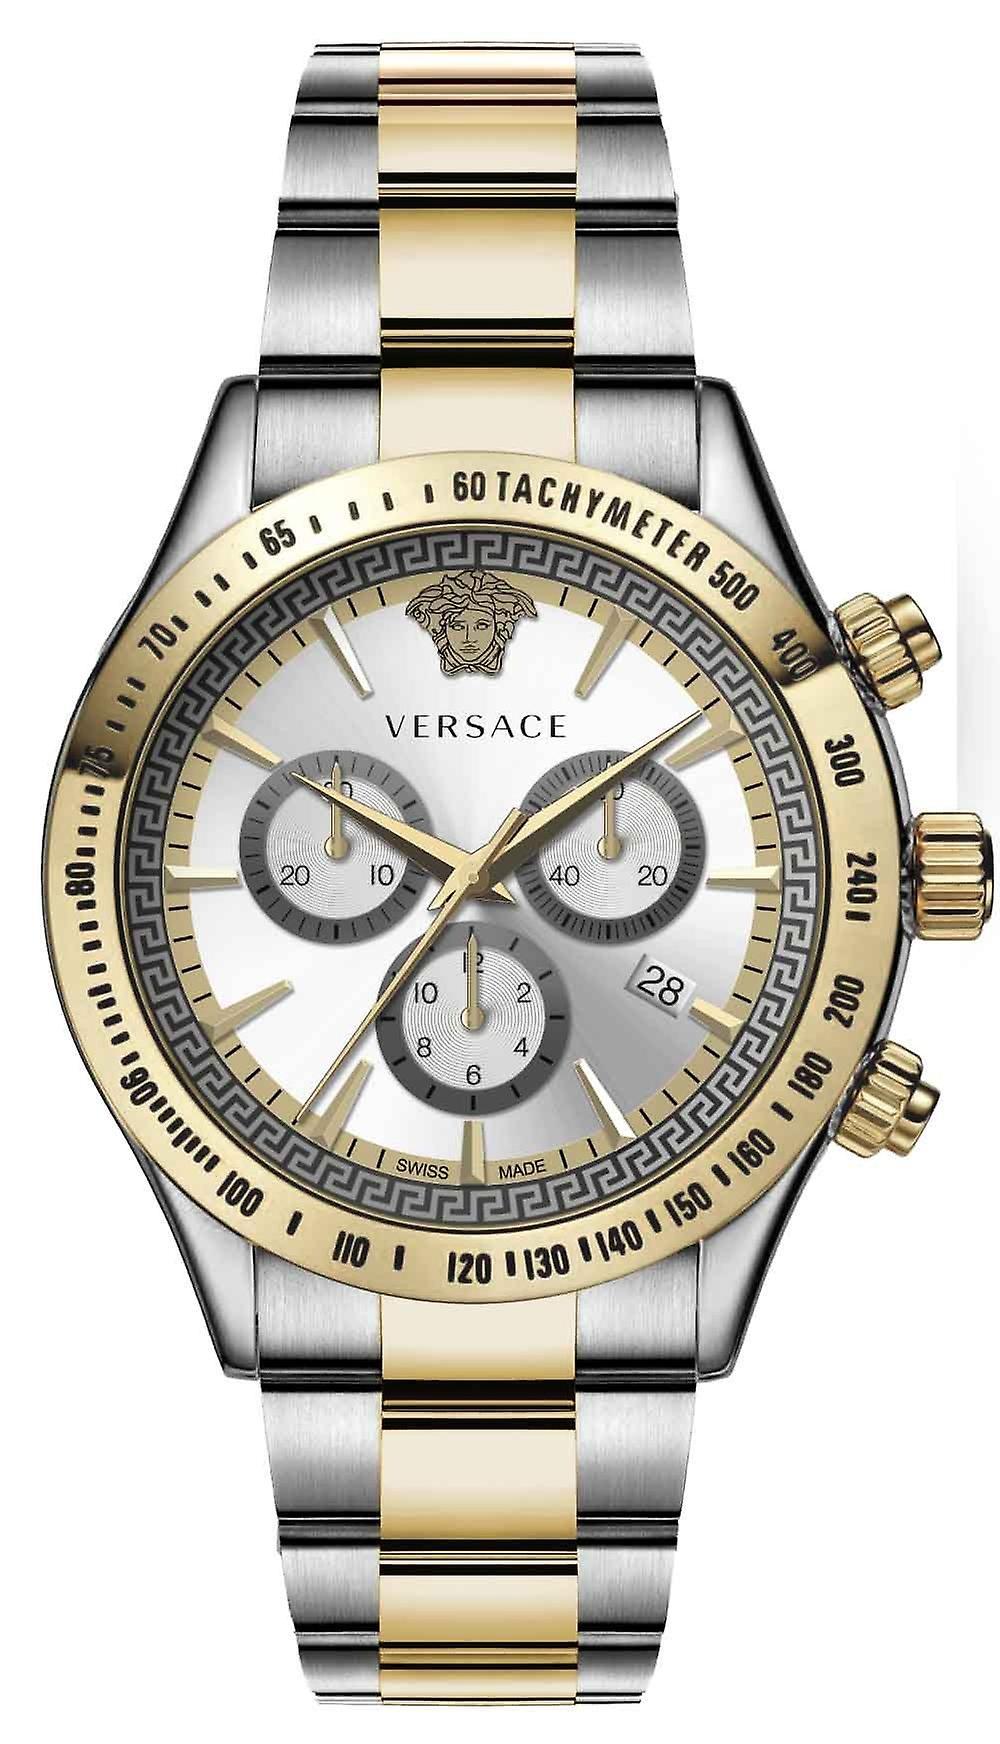 Versace Vev700519 Chrono Classic Men's Watch Chronograph 44 Mm